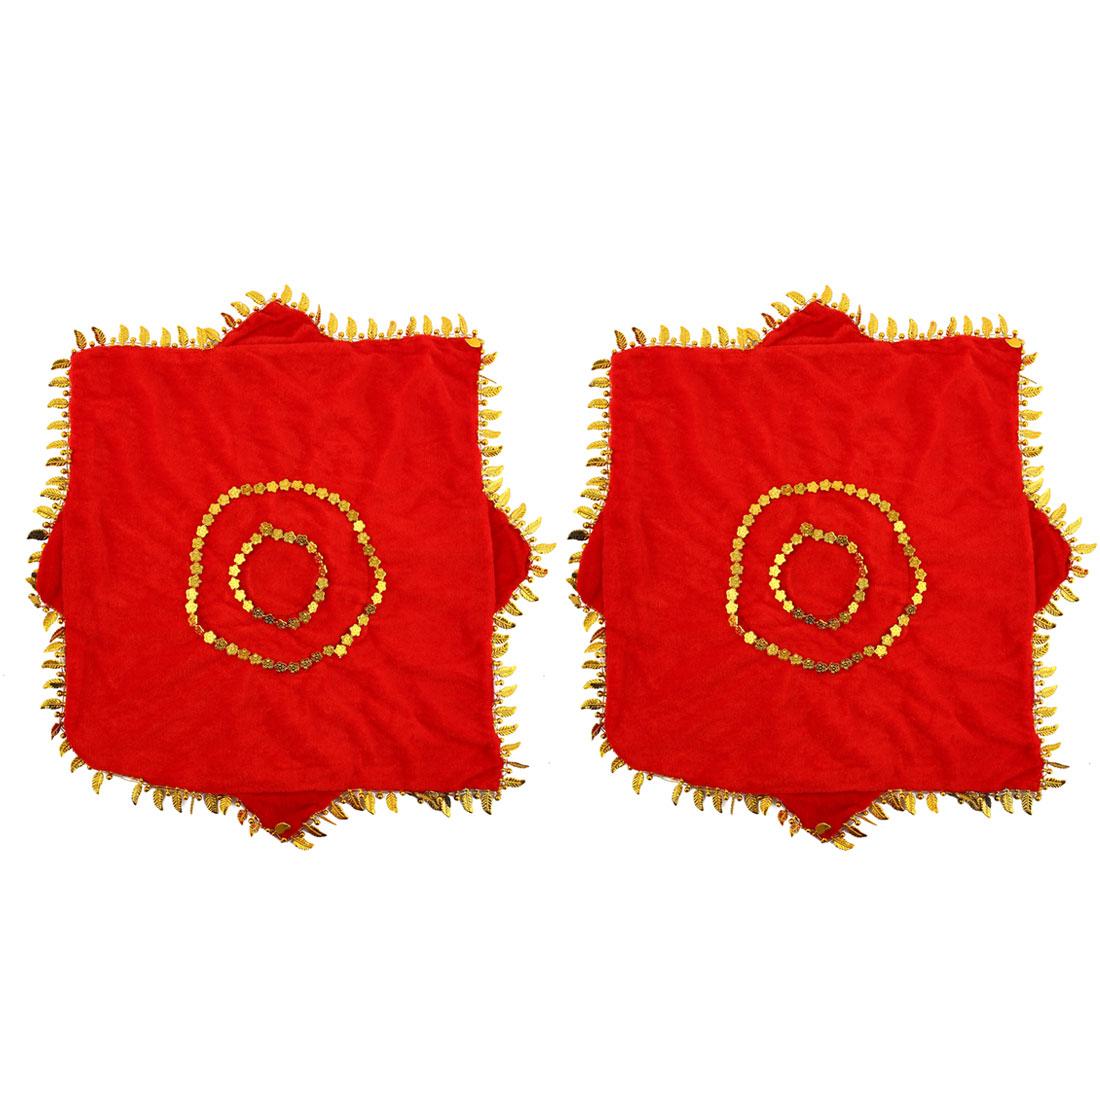 Octagon Shaped Leaves Hem Decor Dance Dancing Handkerchief Red 2 Pcs